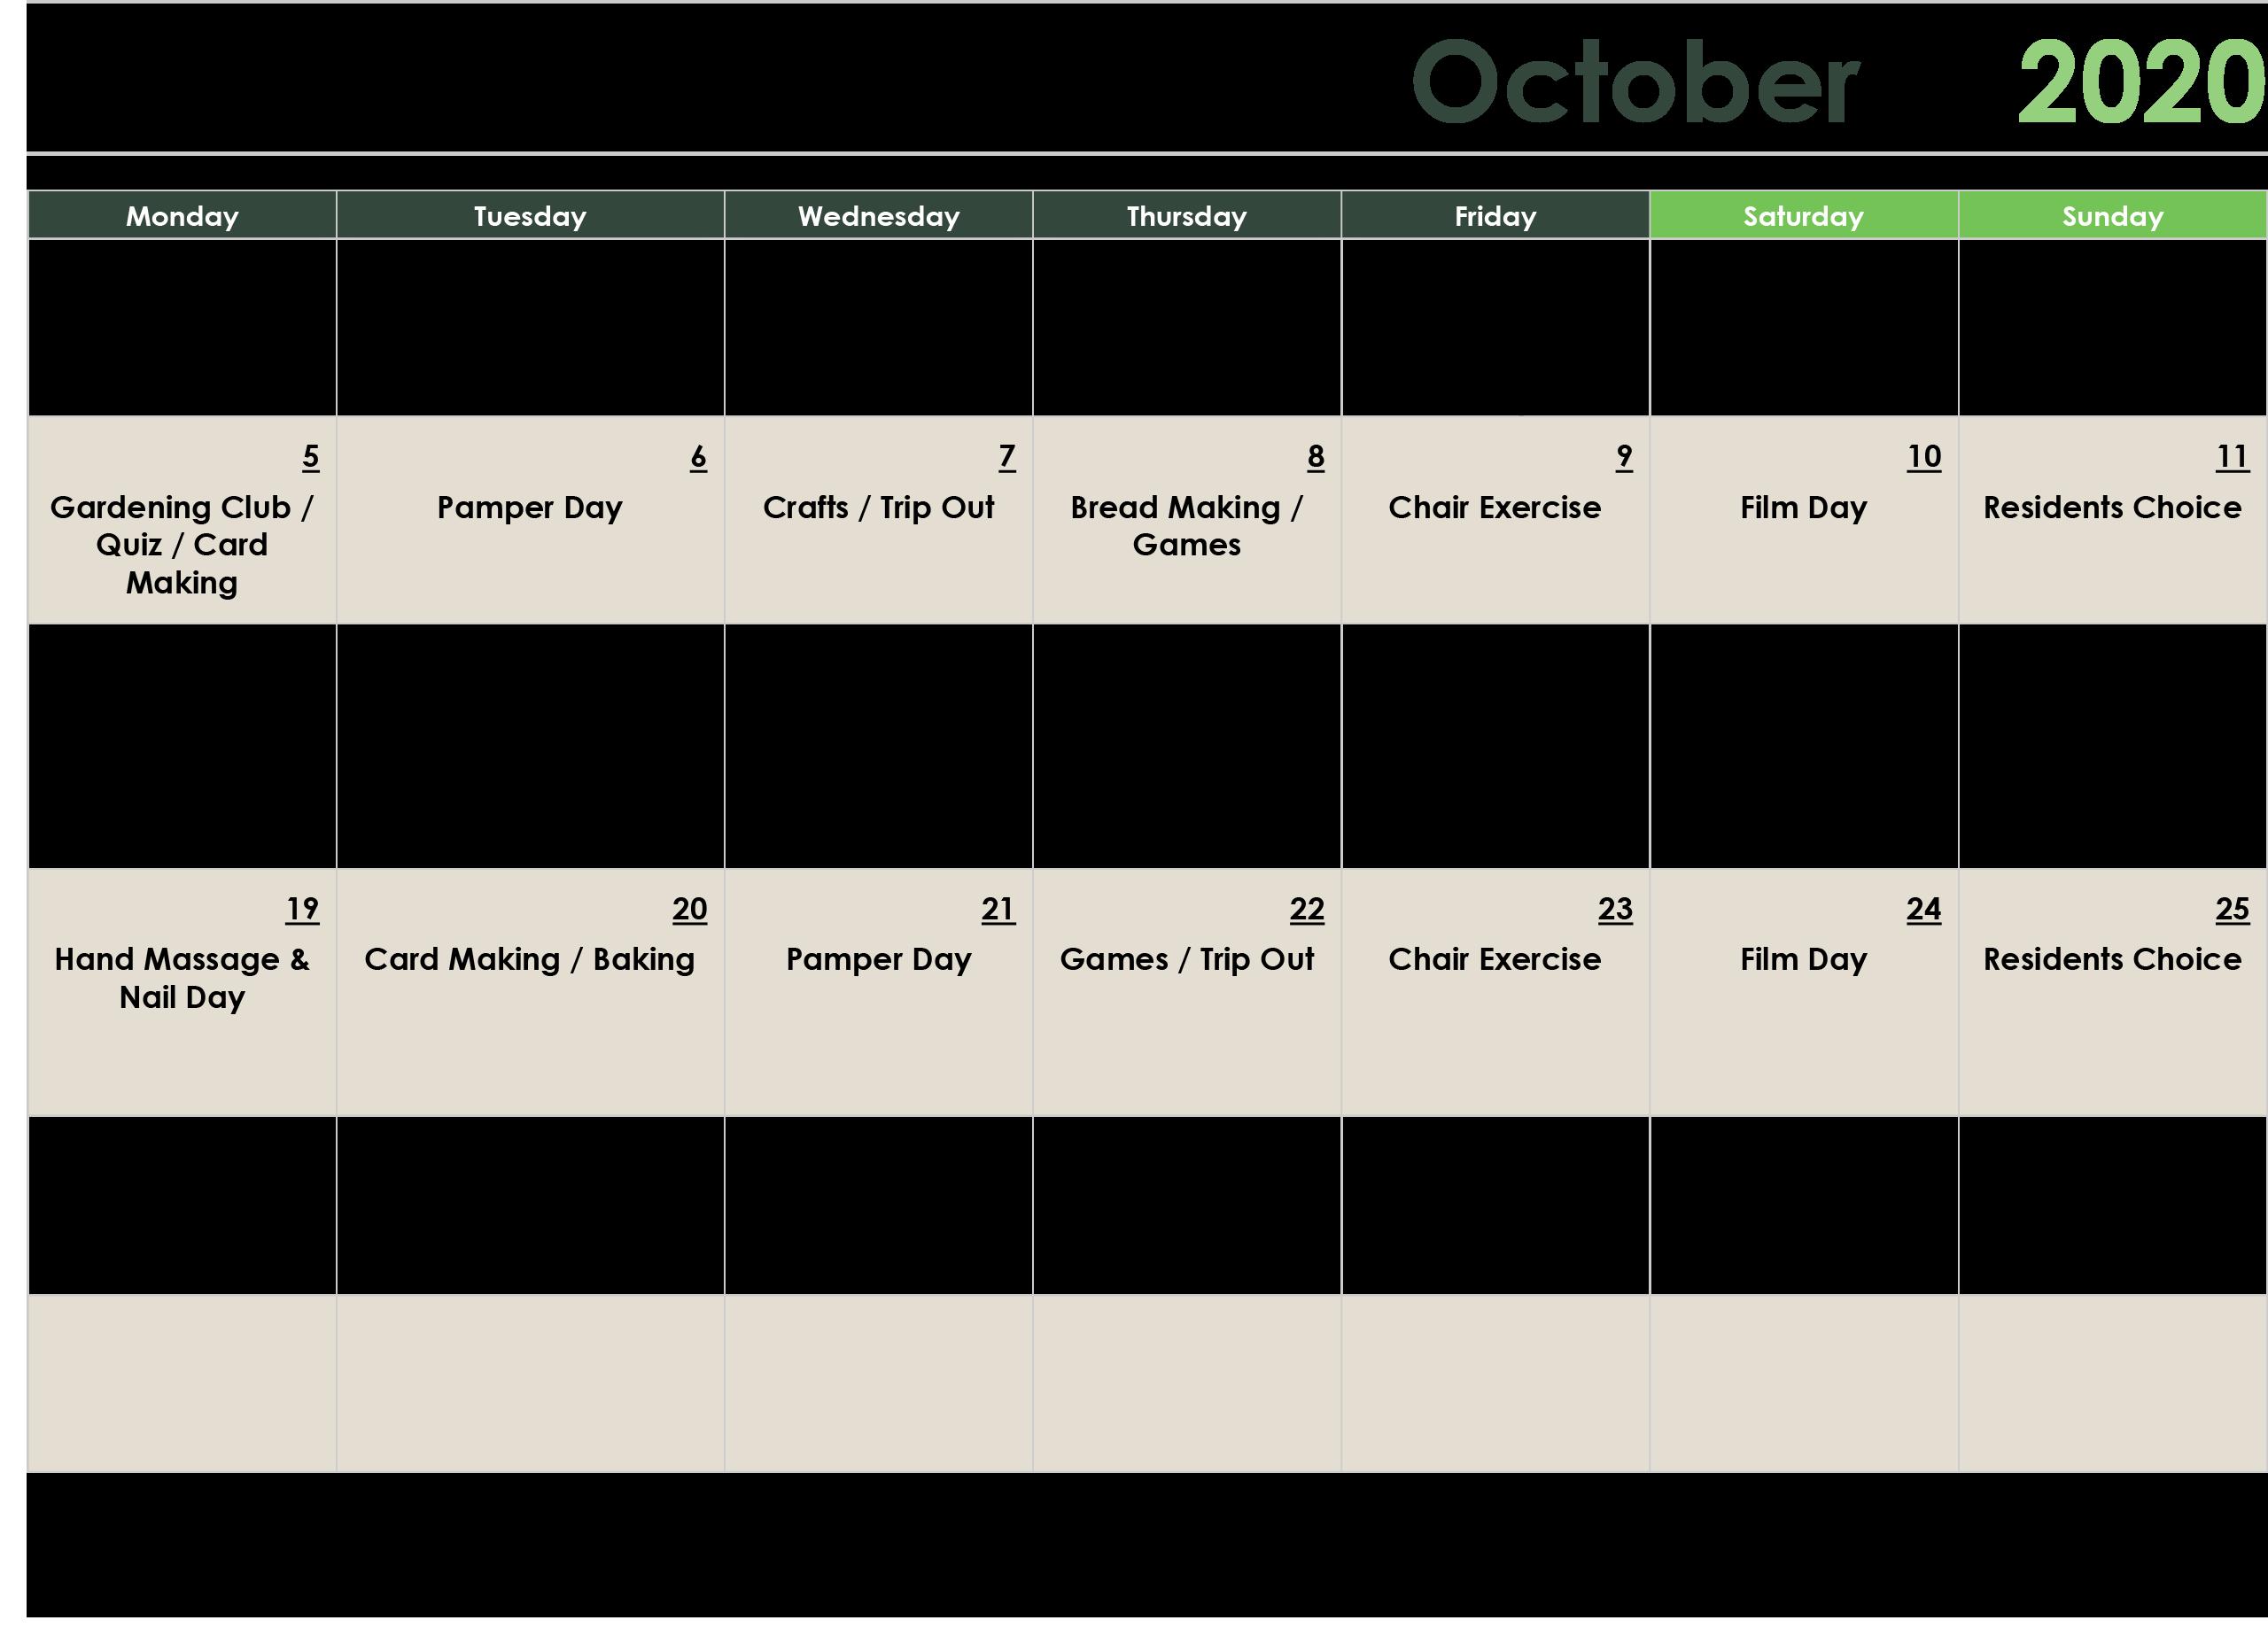 October Care Home Activities